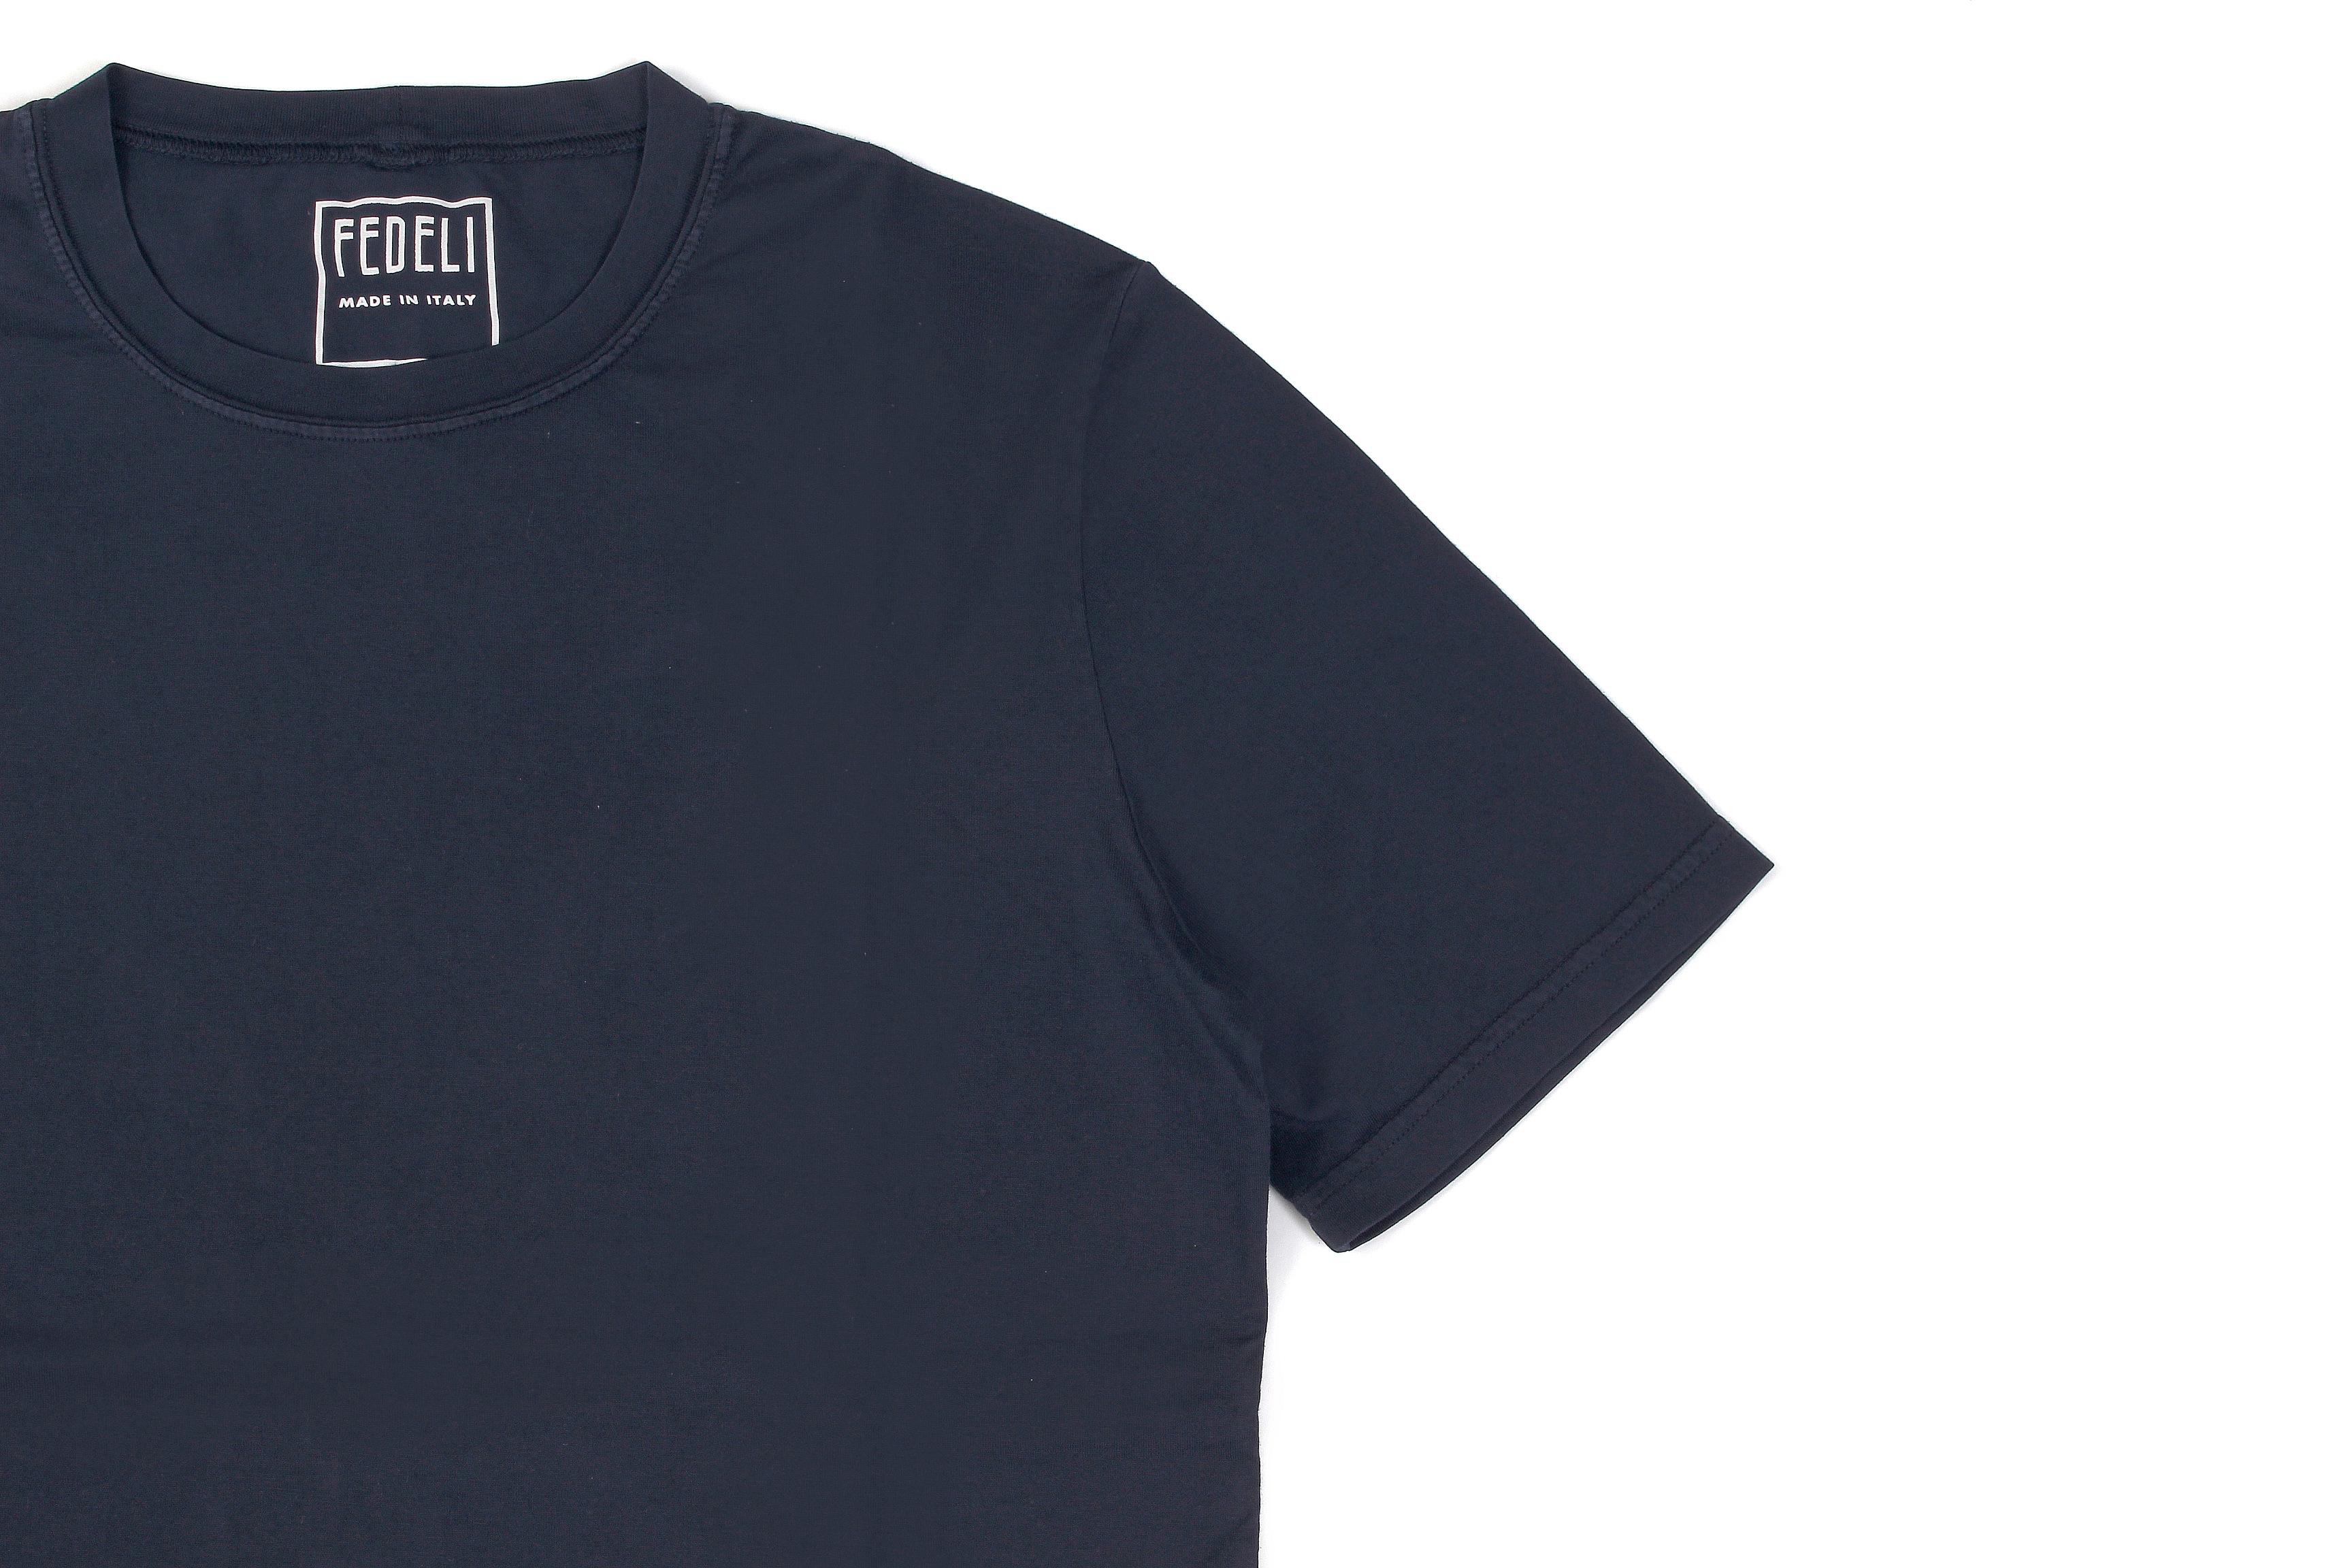 FEDELI(フェデーリ) Crew Neck T-shirt (クルーネック Tシャツ) ギザコットン Tシャツ NAVY (ネイビー・628) made in italy (イタリア製) 2020 春夏 【ご予約開始】愛知 名古屋 altoediritto アルトエデリット TEE